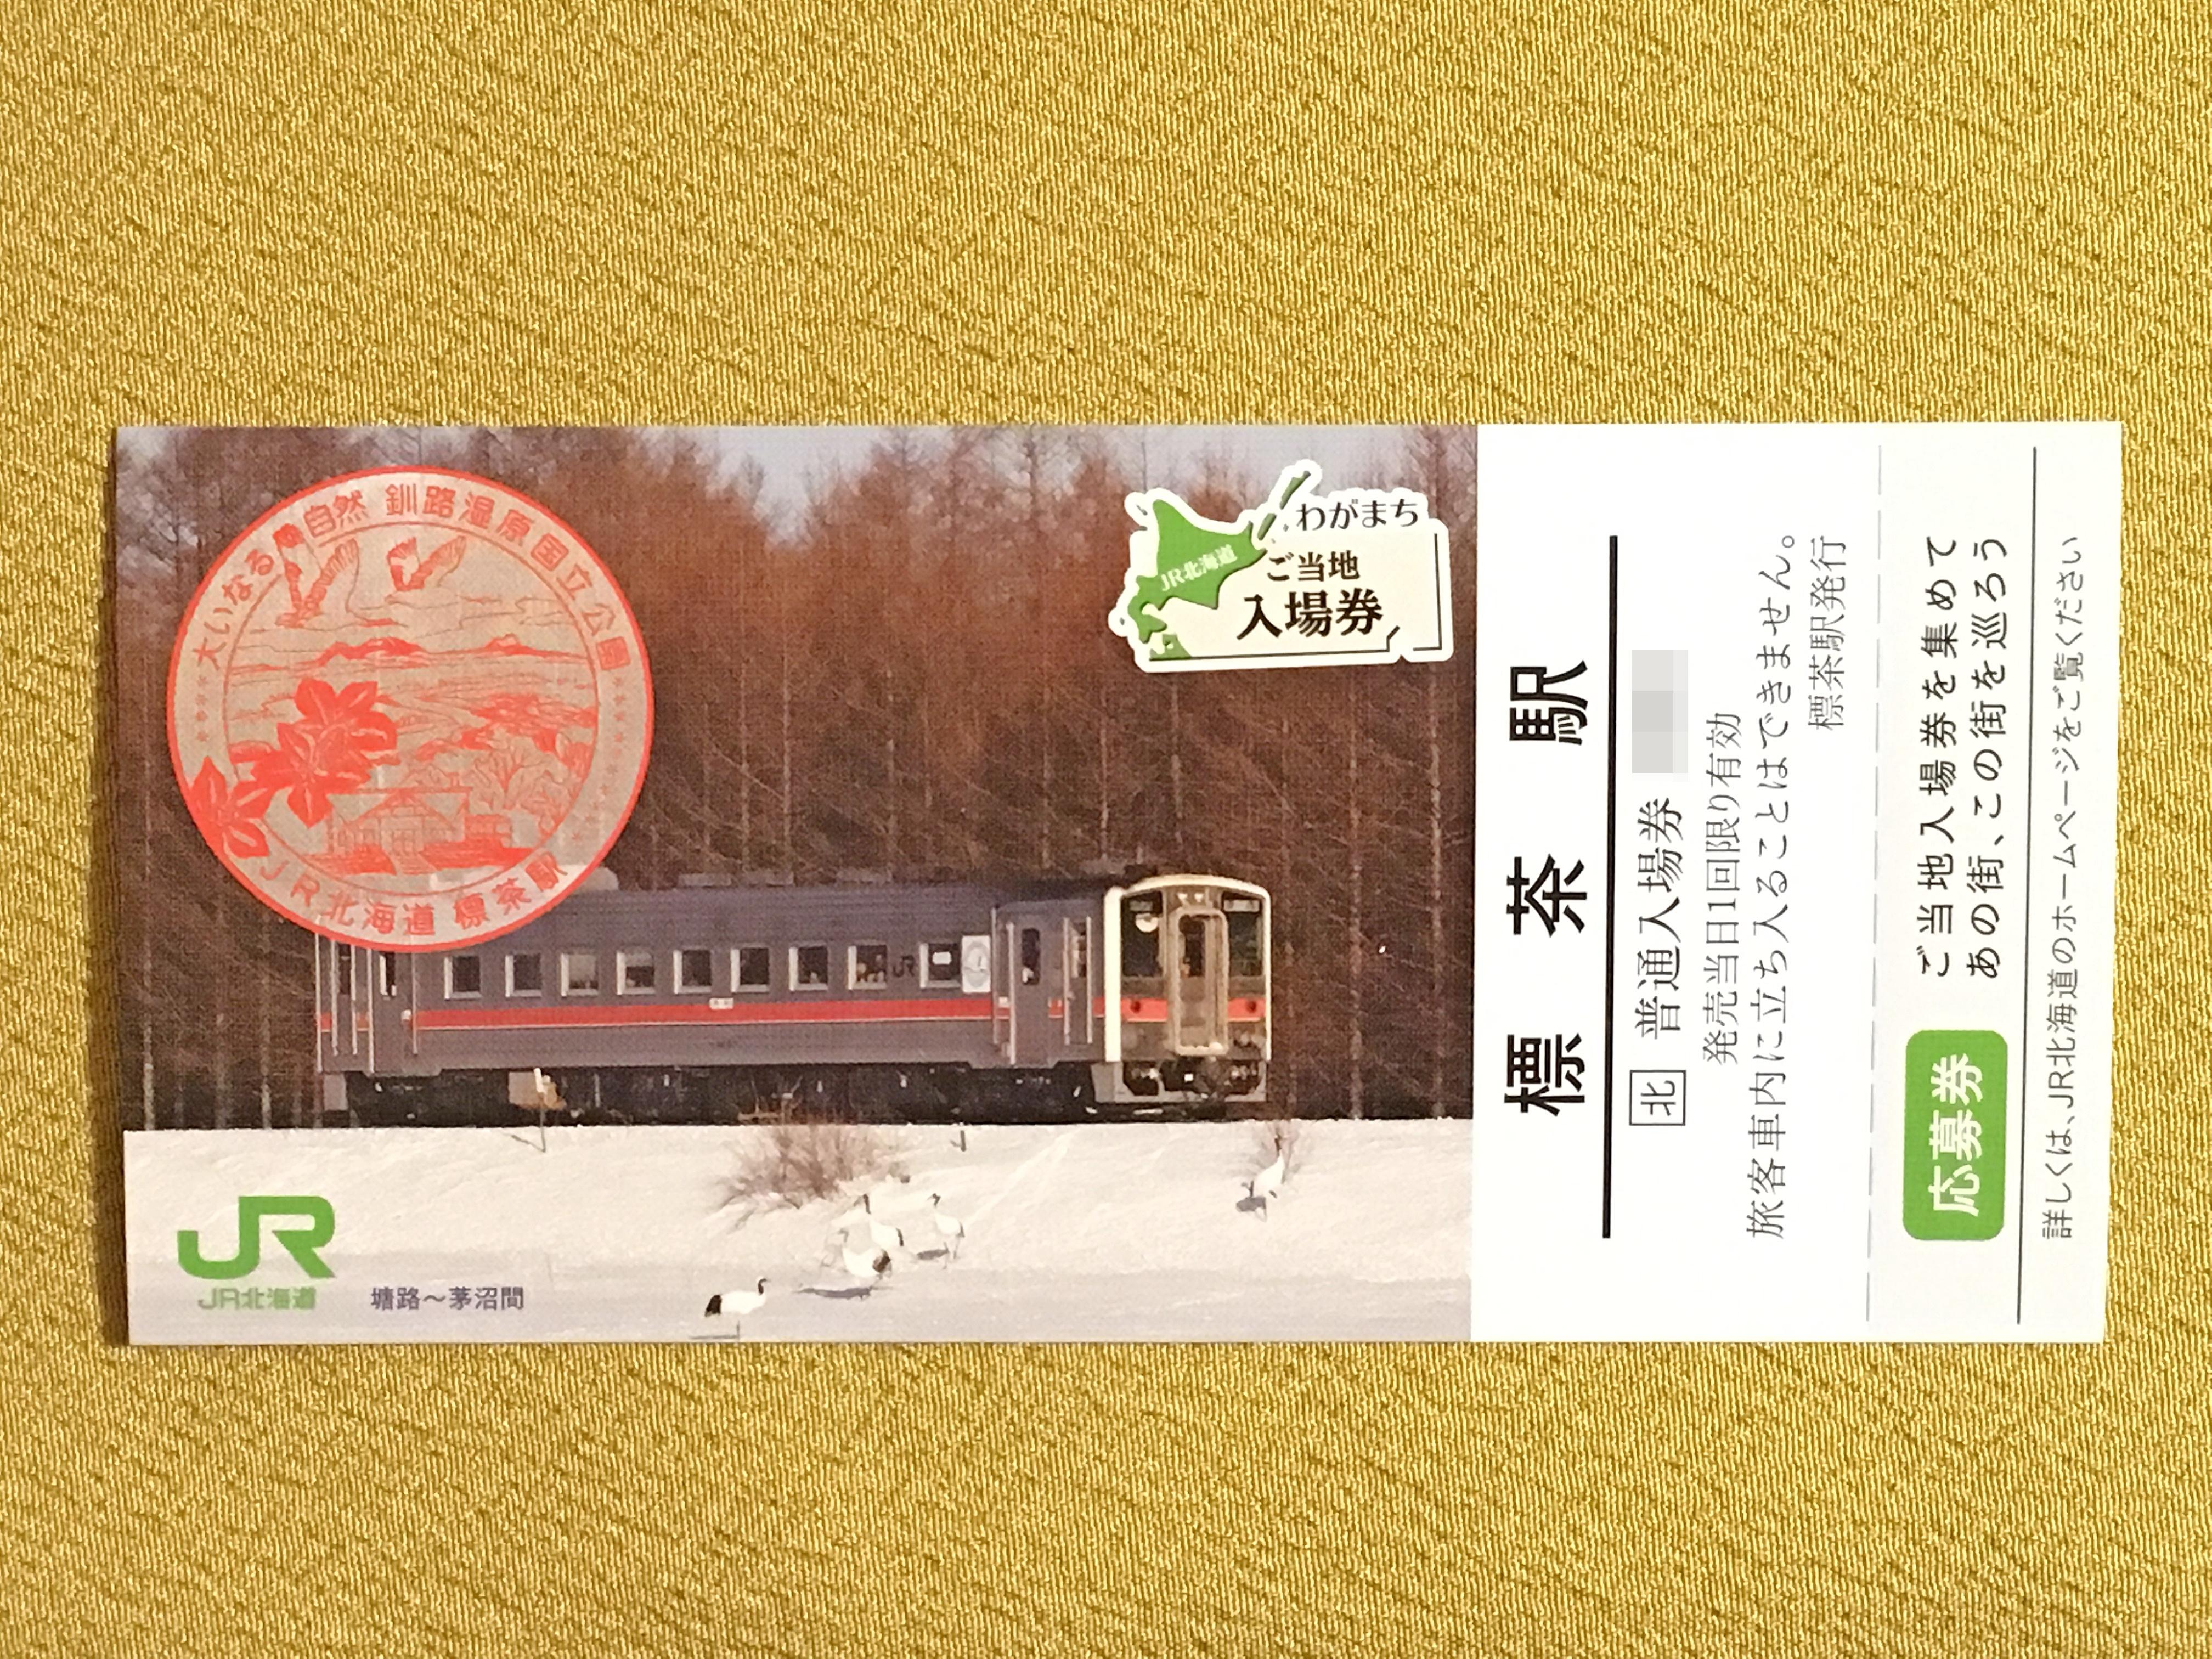 JR北海道ご当地入場券  標茶駅表.JPG